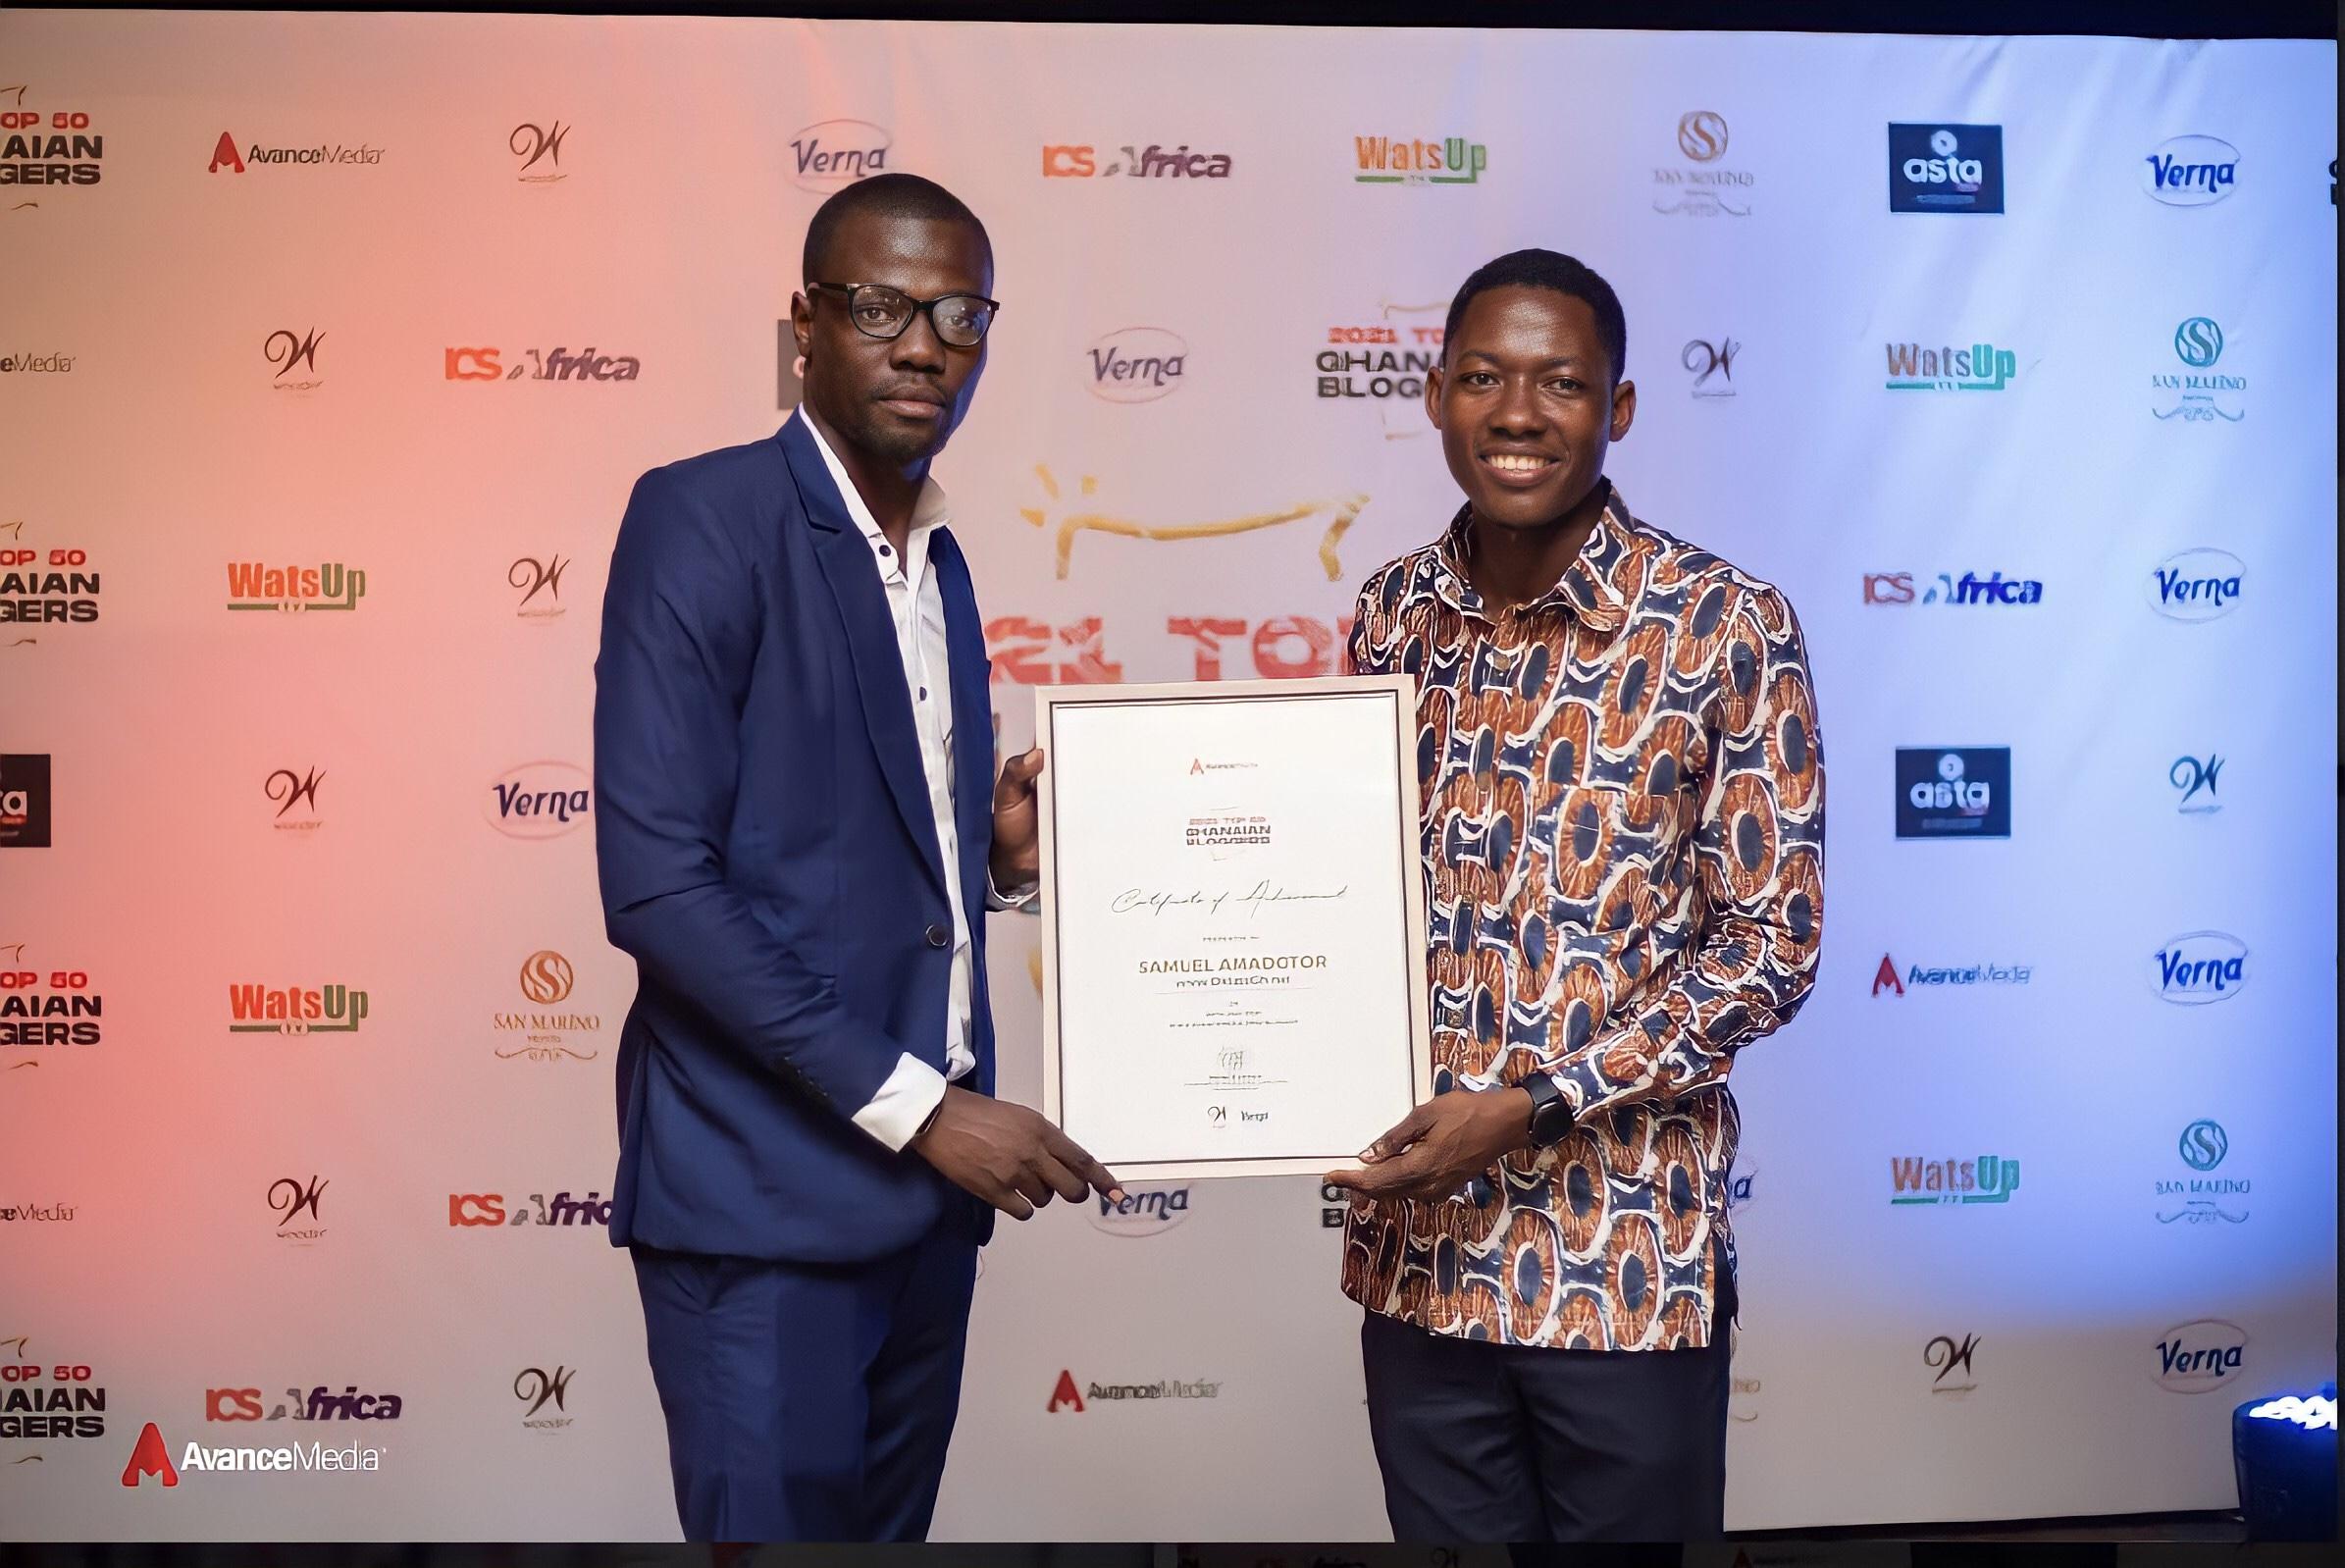 D.Klass GH Listed Among Top 50 Ghanaian Bloggers